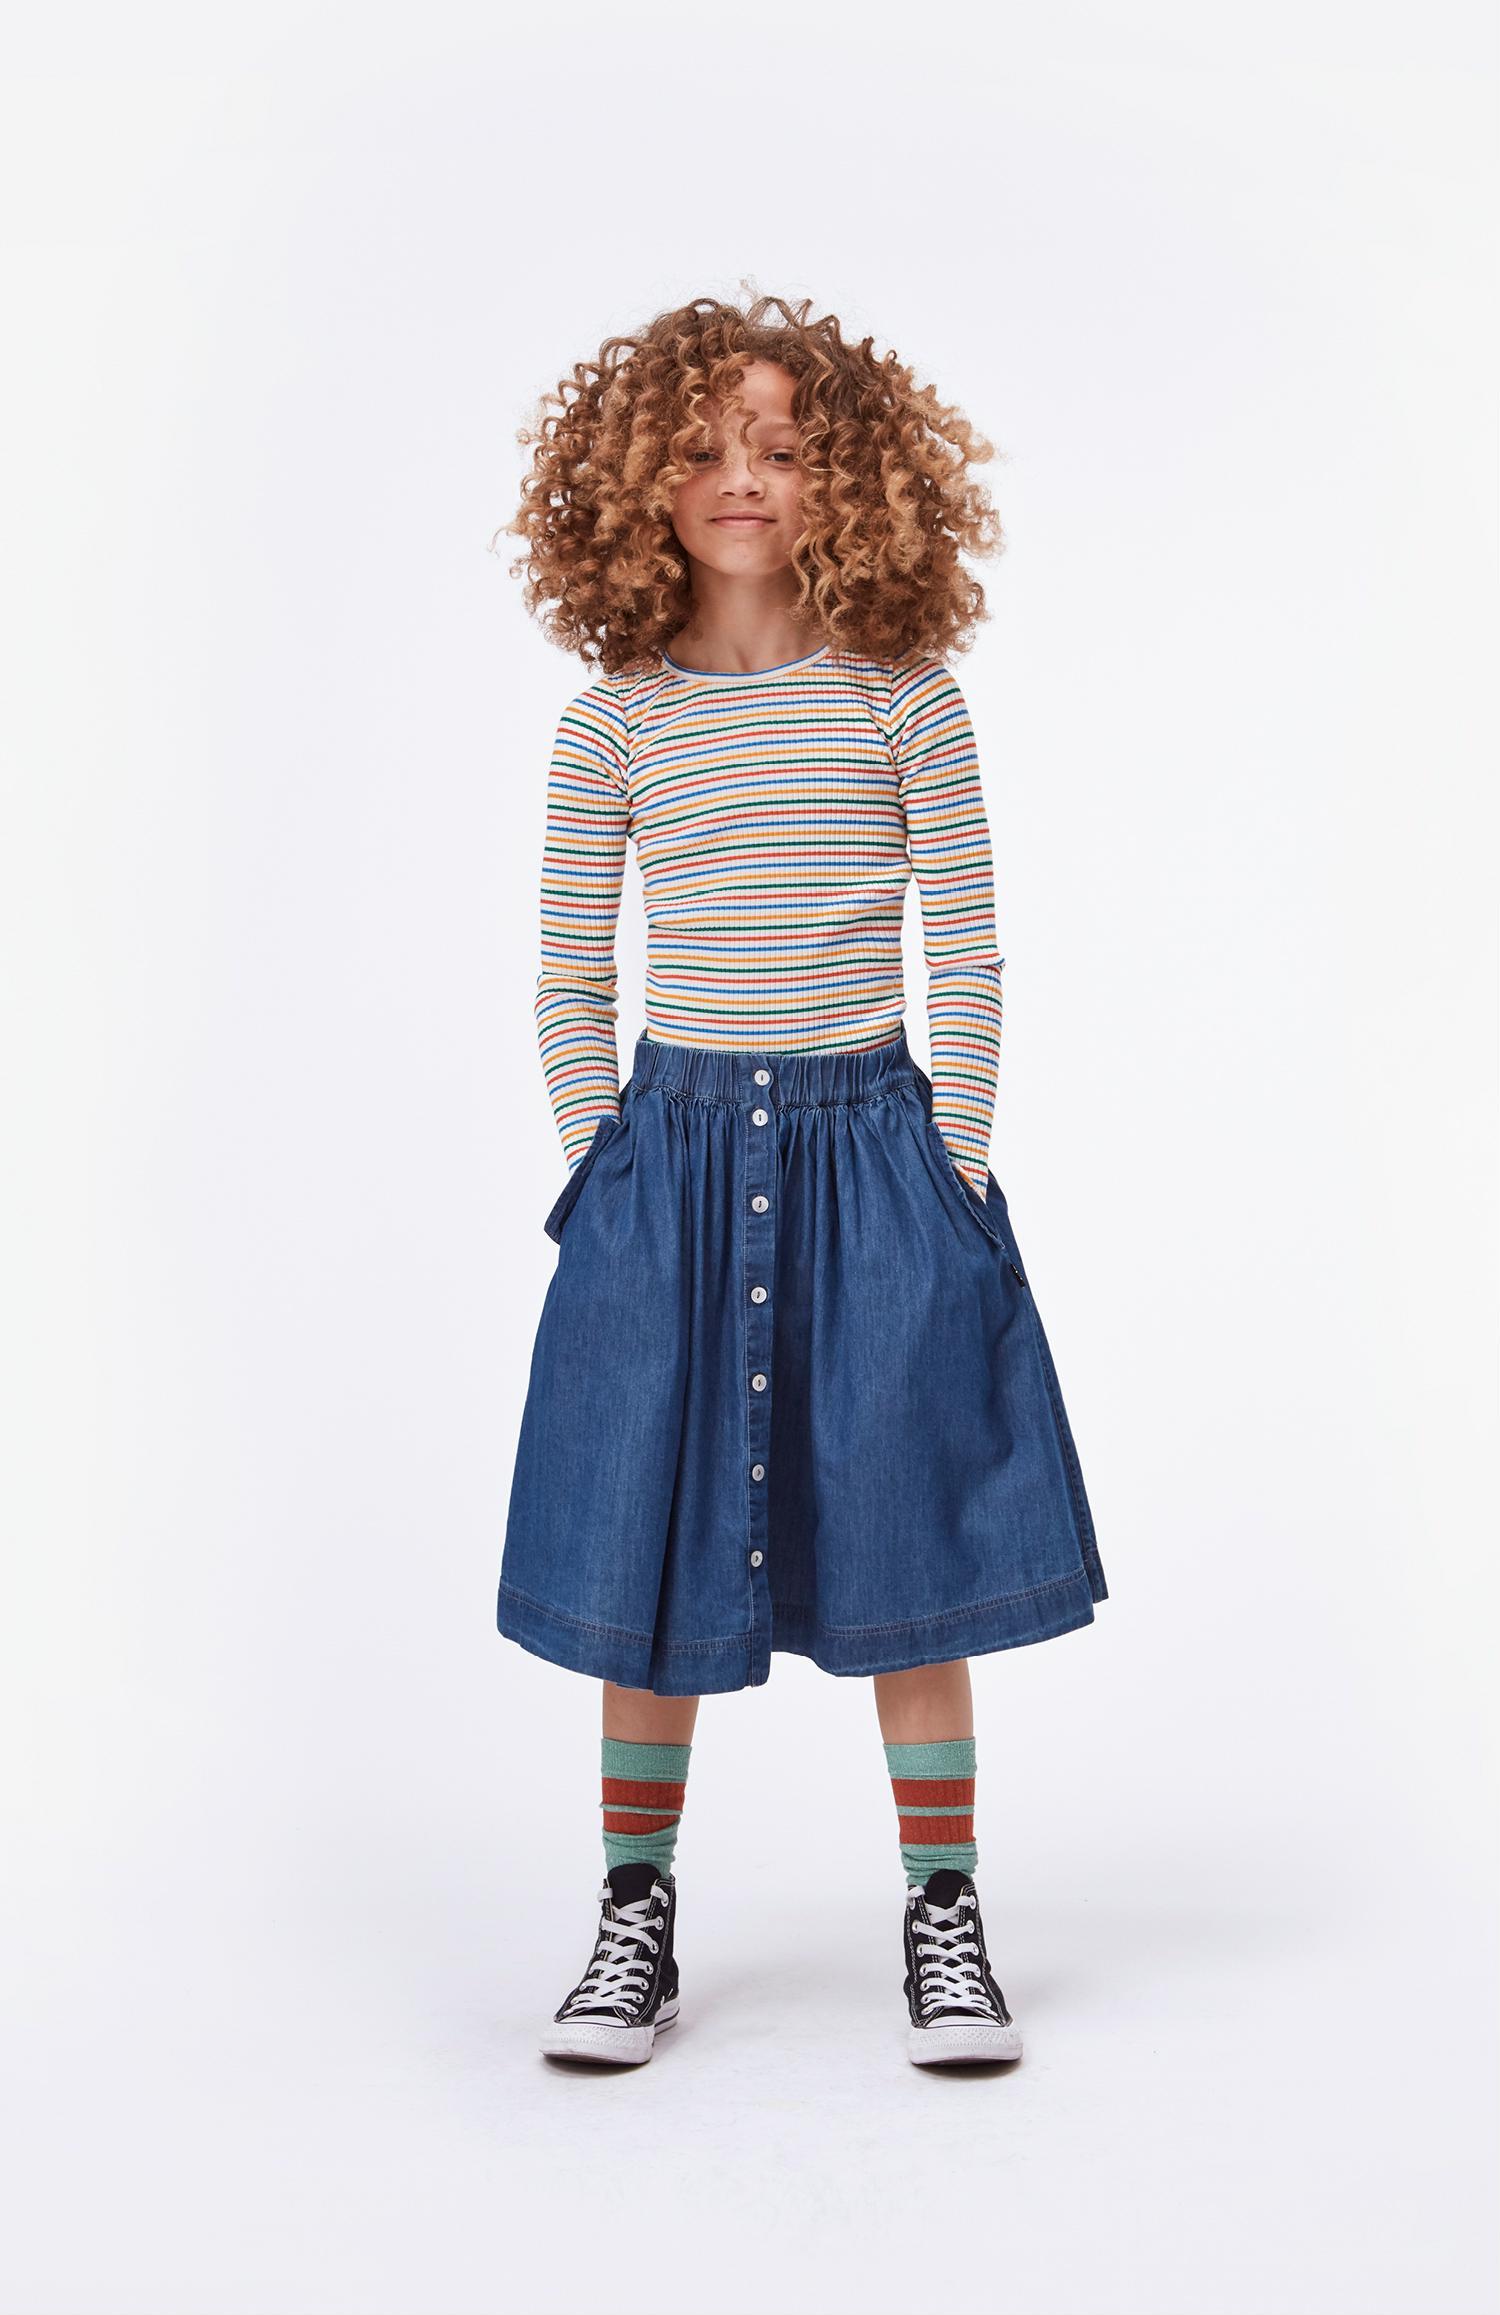 molo rochelle t-shirt fine rainbow stripe